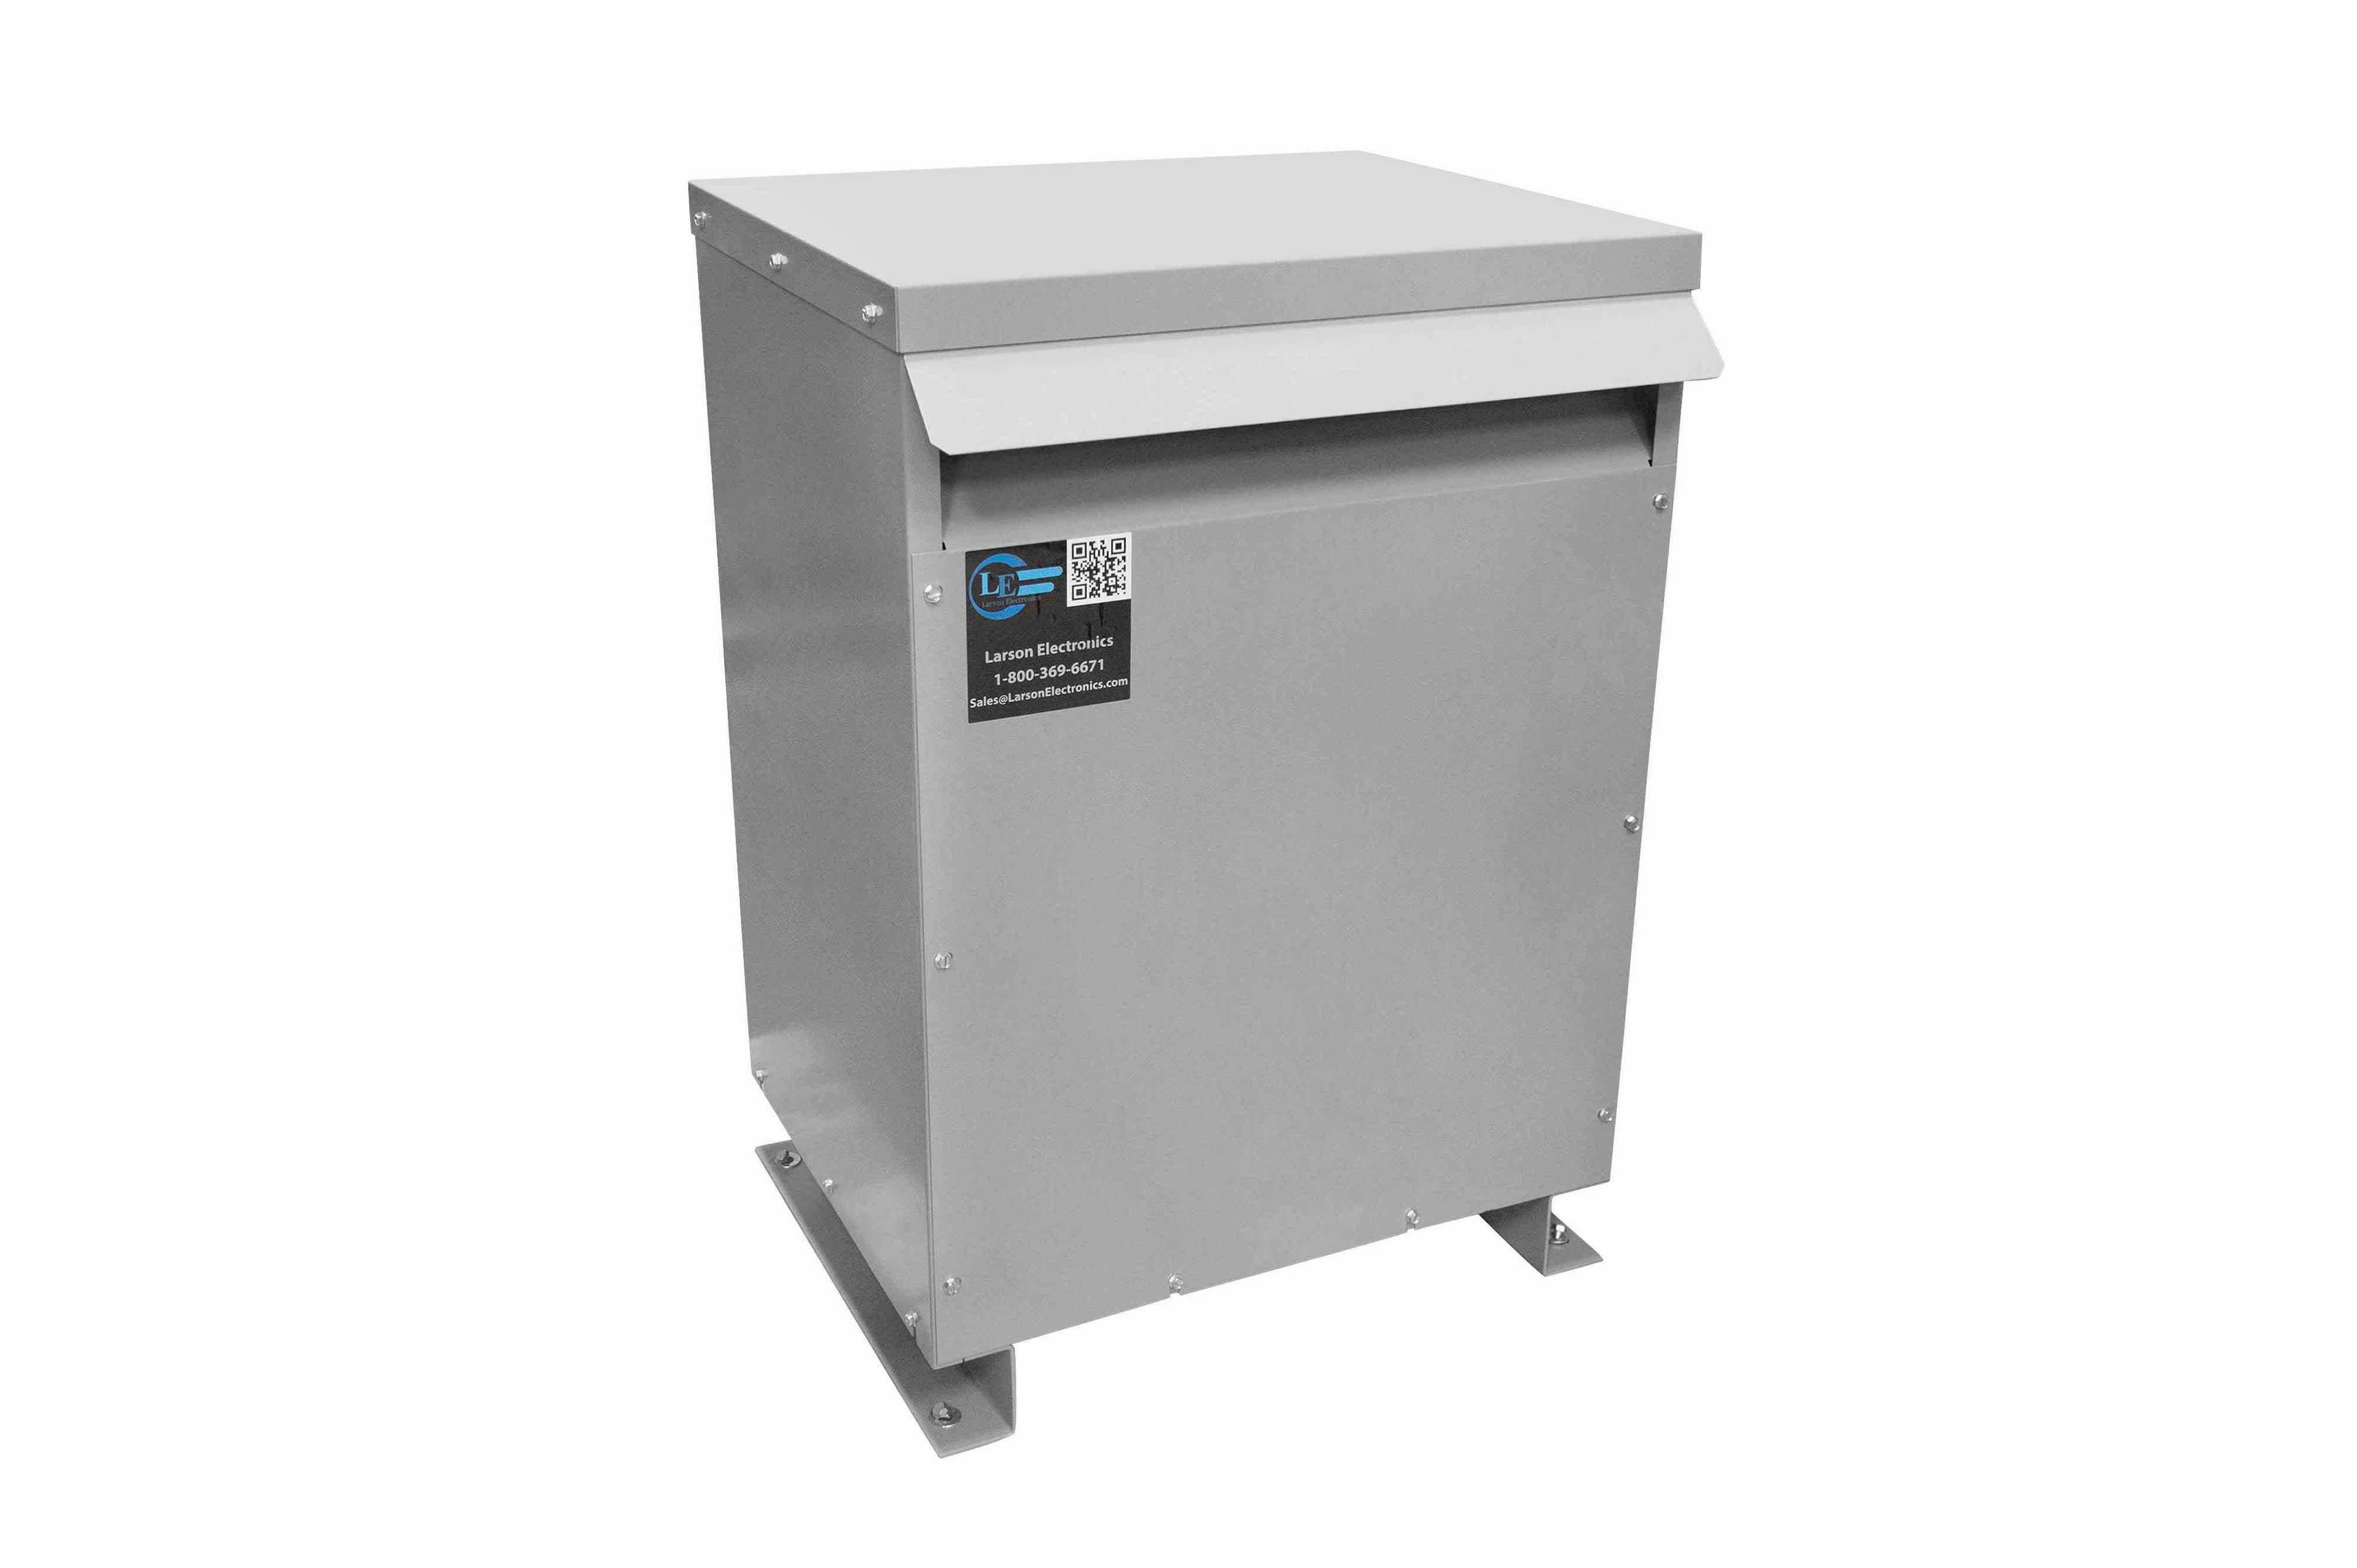 600 kVA 3PH Isolation Transformer, 460V Wye Primary, 575V Delta Secondary, N3R, Ventilated, 60 Hz